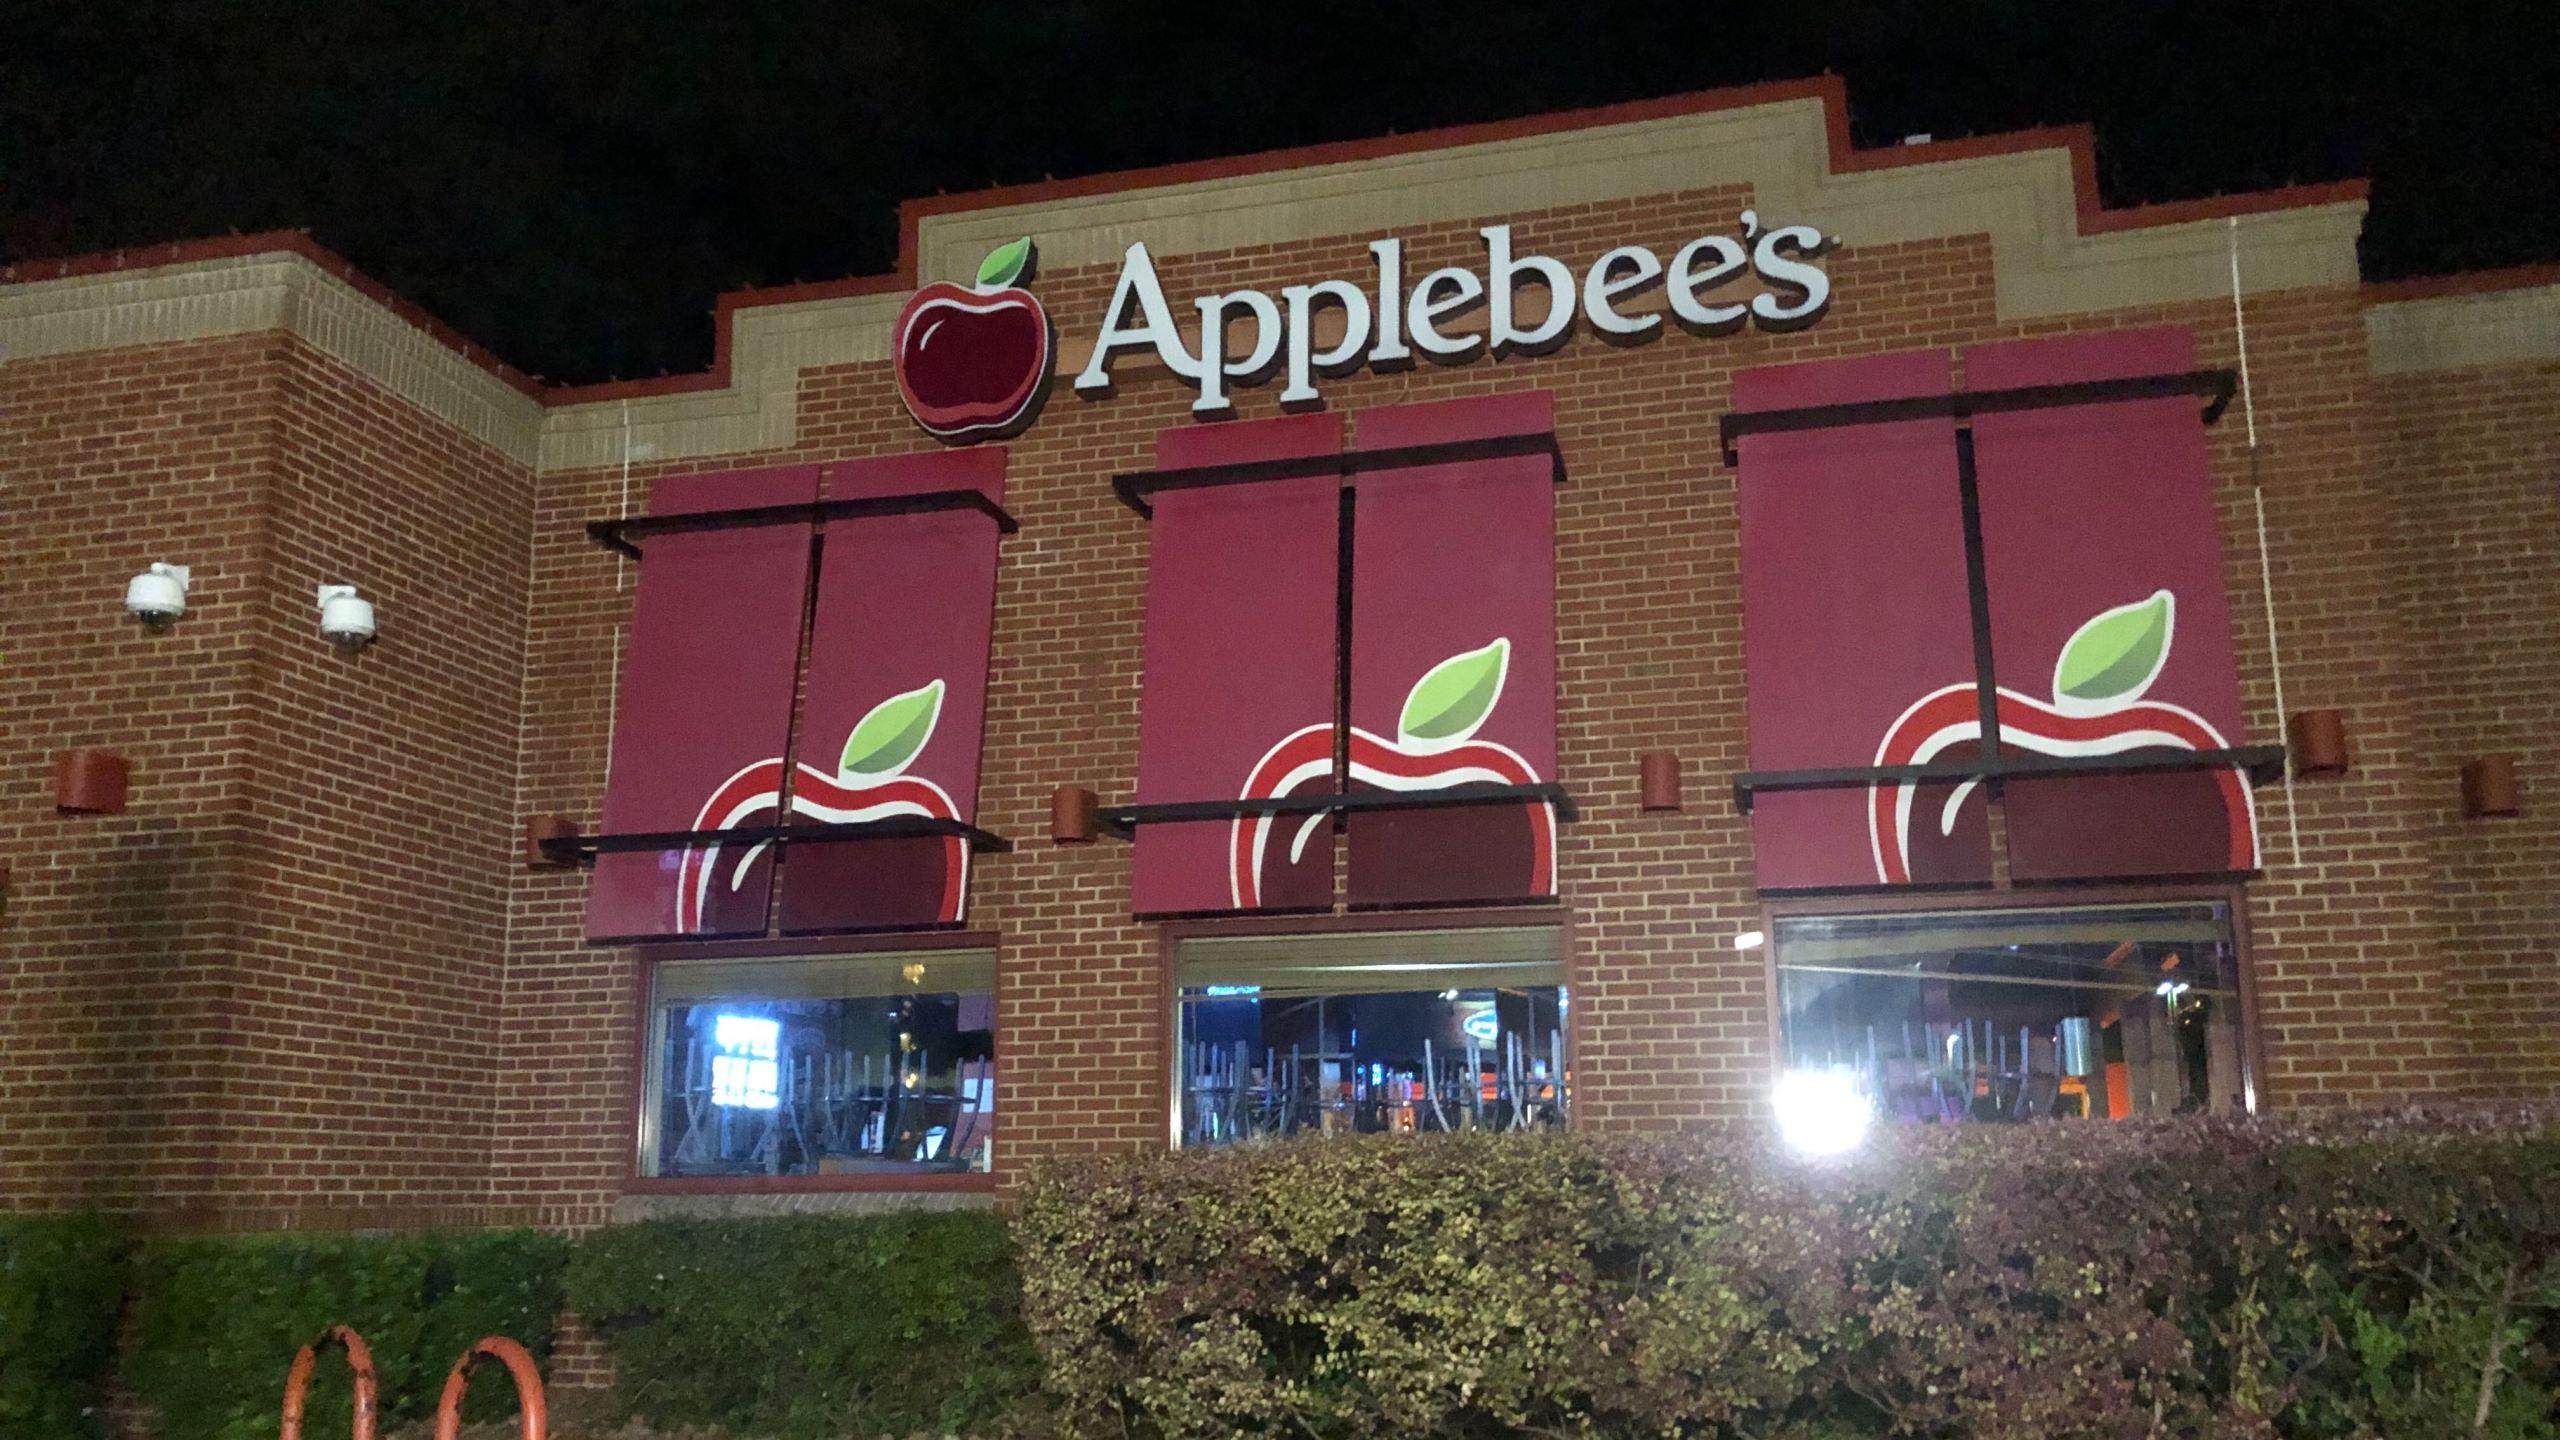 Applebee's where male victim was shot